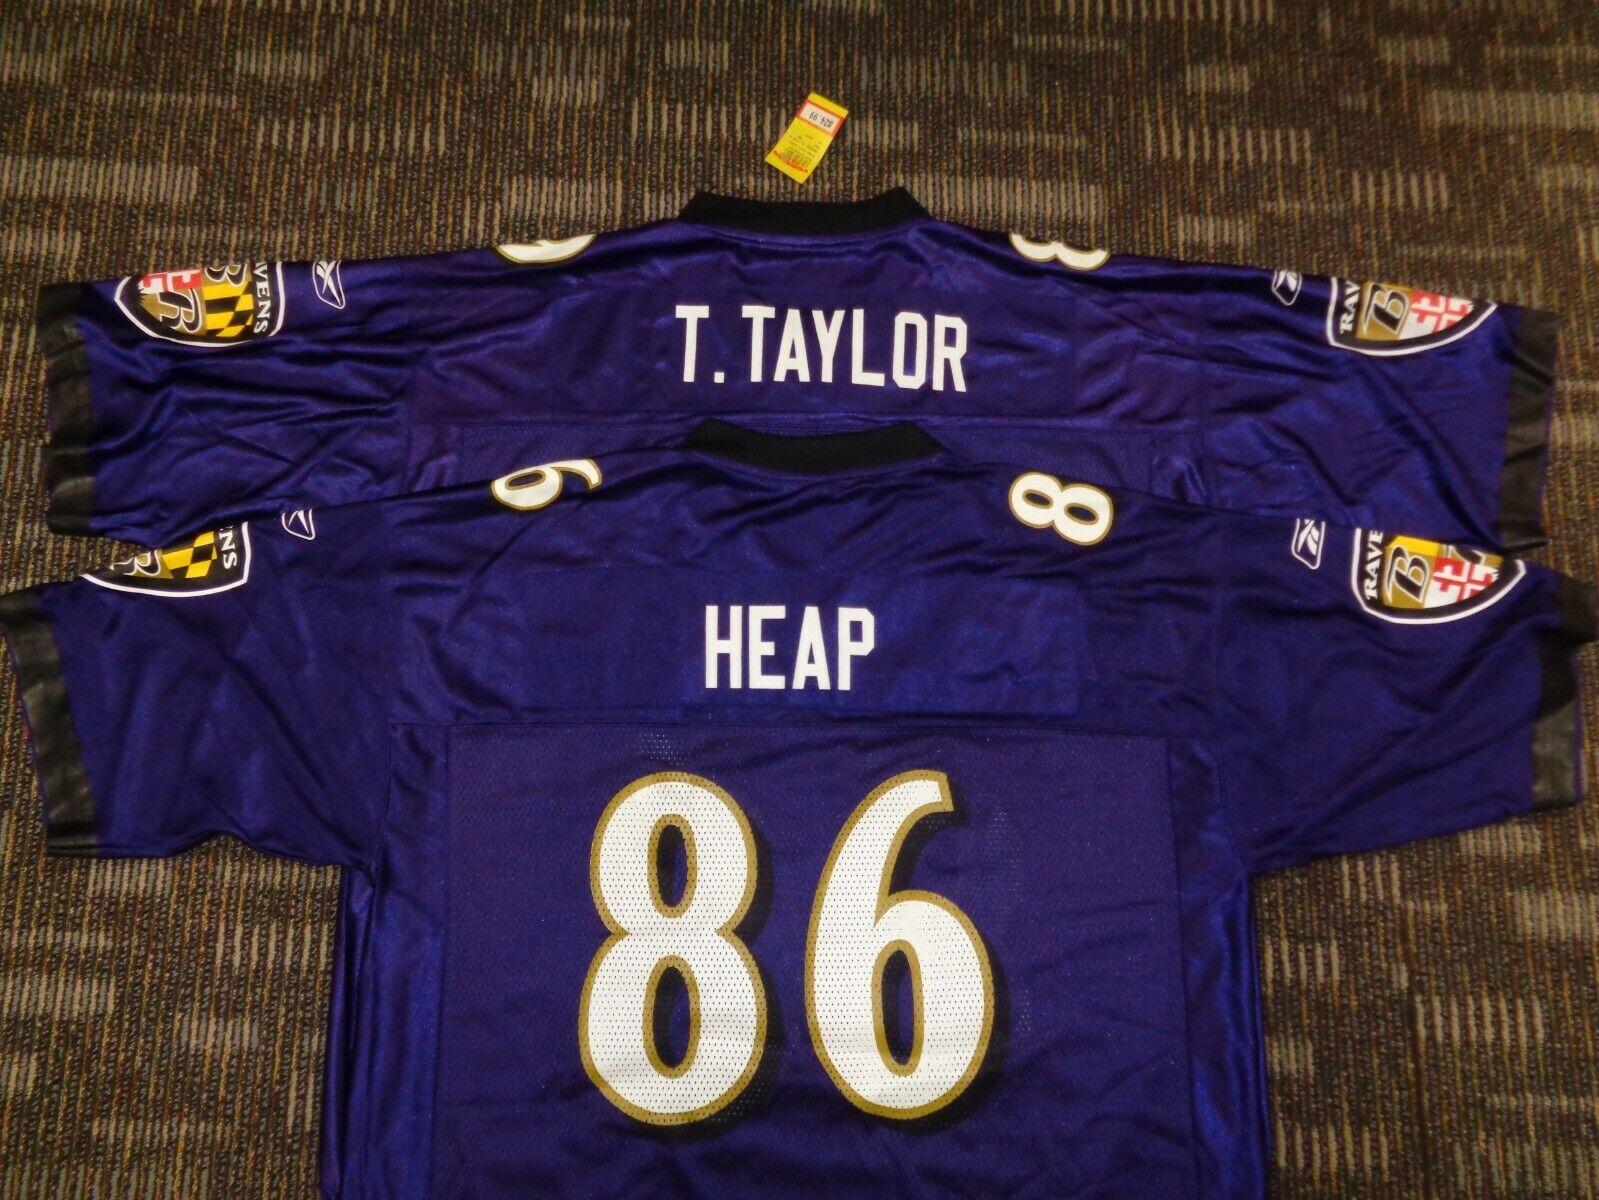 LOT-TODD HEAP TRAVIS TAYLOR BALTIMORE RAVENS REEBOK NFL GAME FOOTBALL JERSEYS  - $39.99